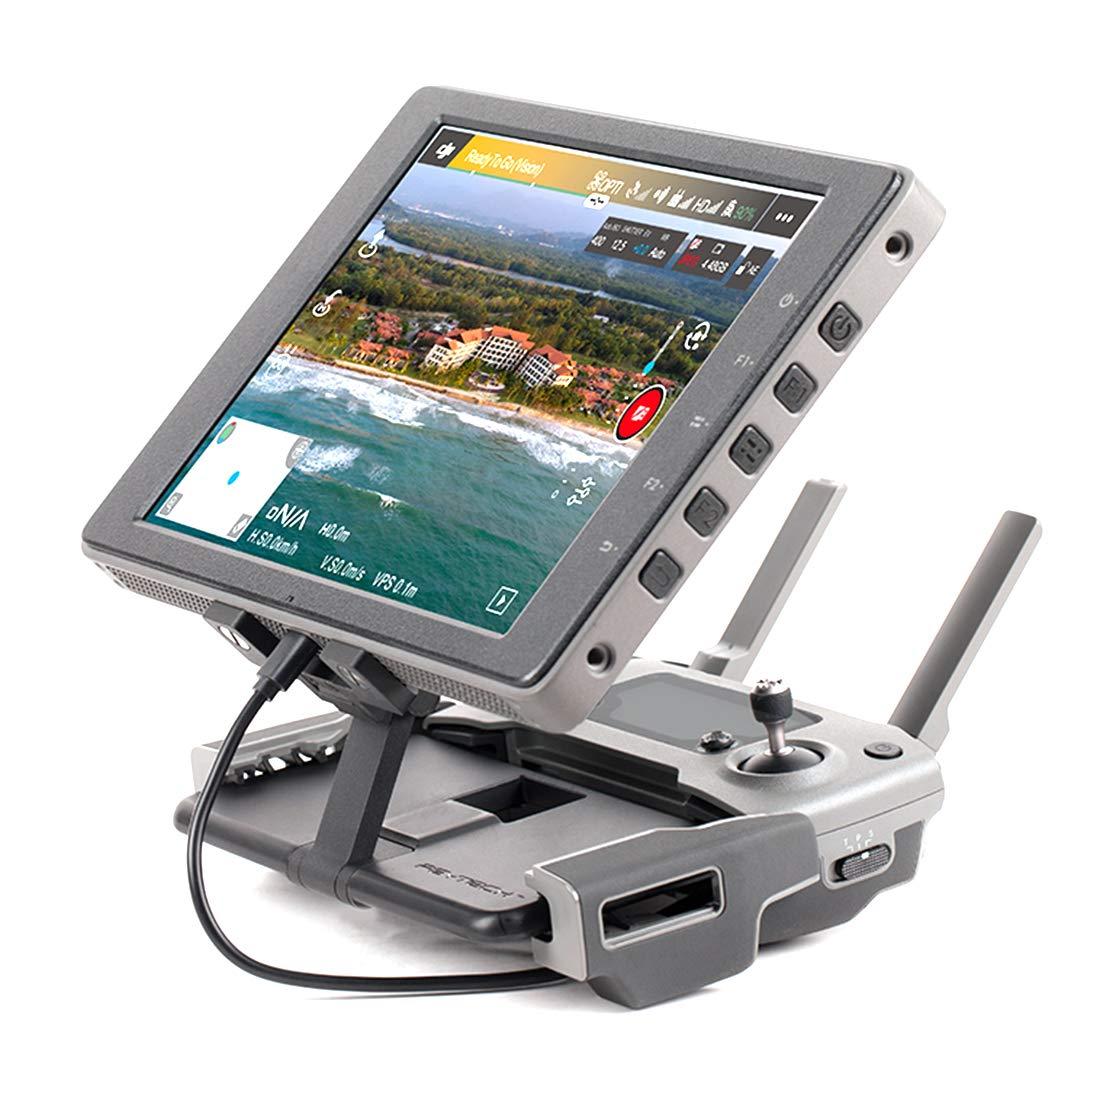 PGYTECH Foldable CrystalSky Mounting Bracket Holder for DJI Mavic 2/Mavic Pro/Mavic Air/Spark